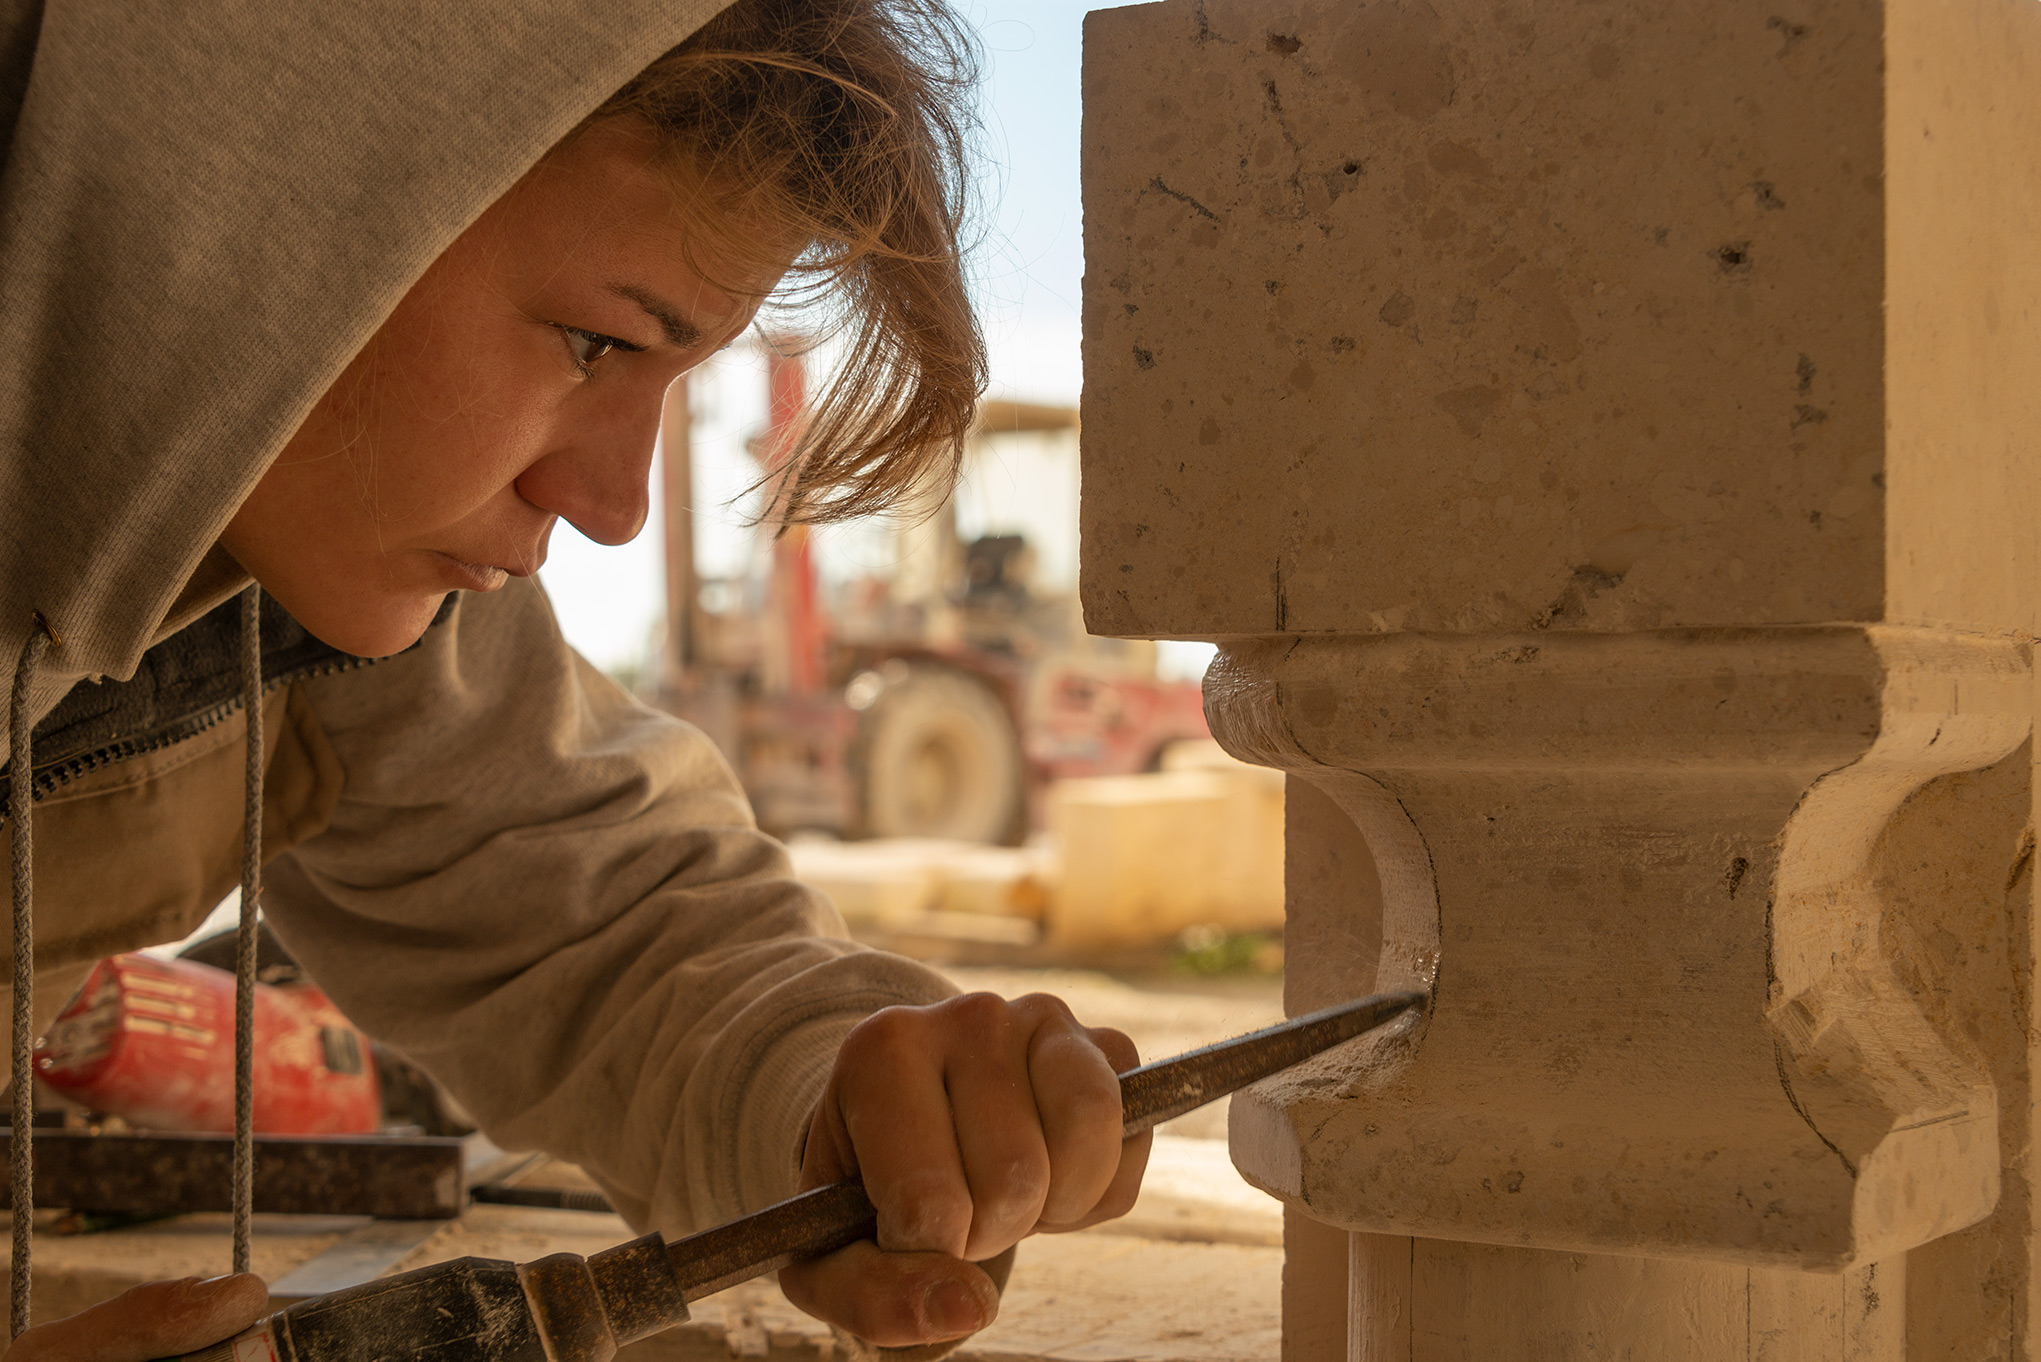 Trainee stone mason at work - France